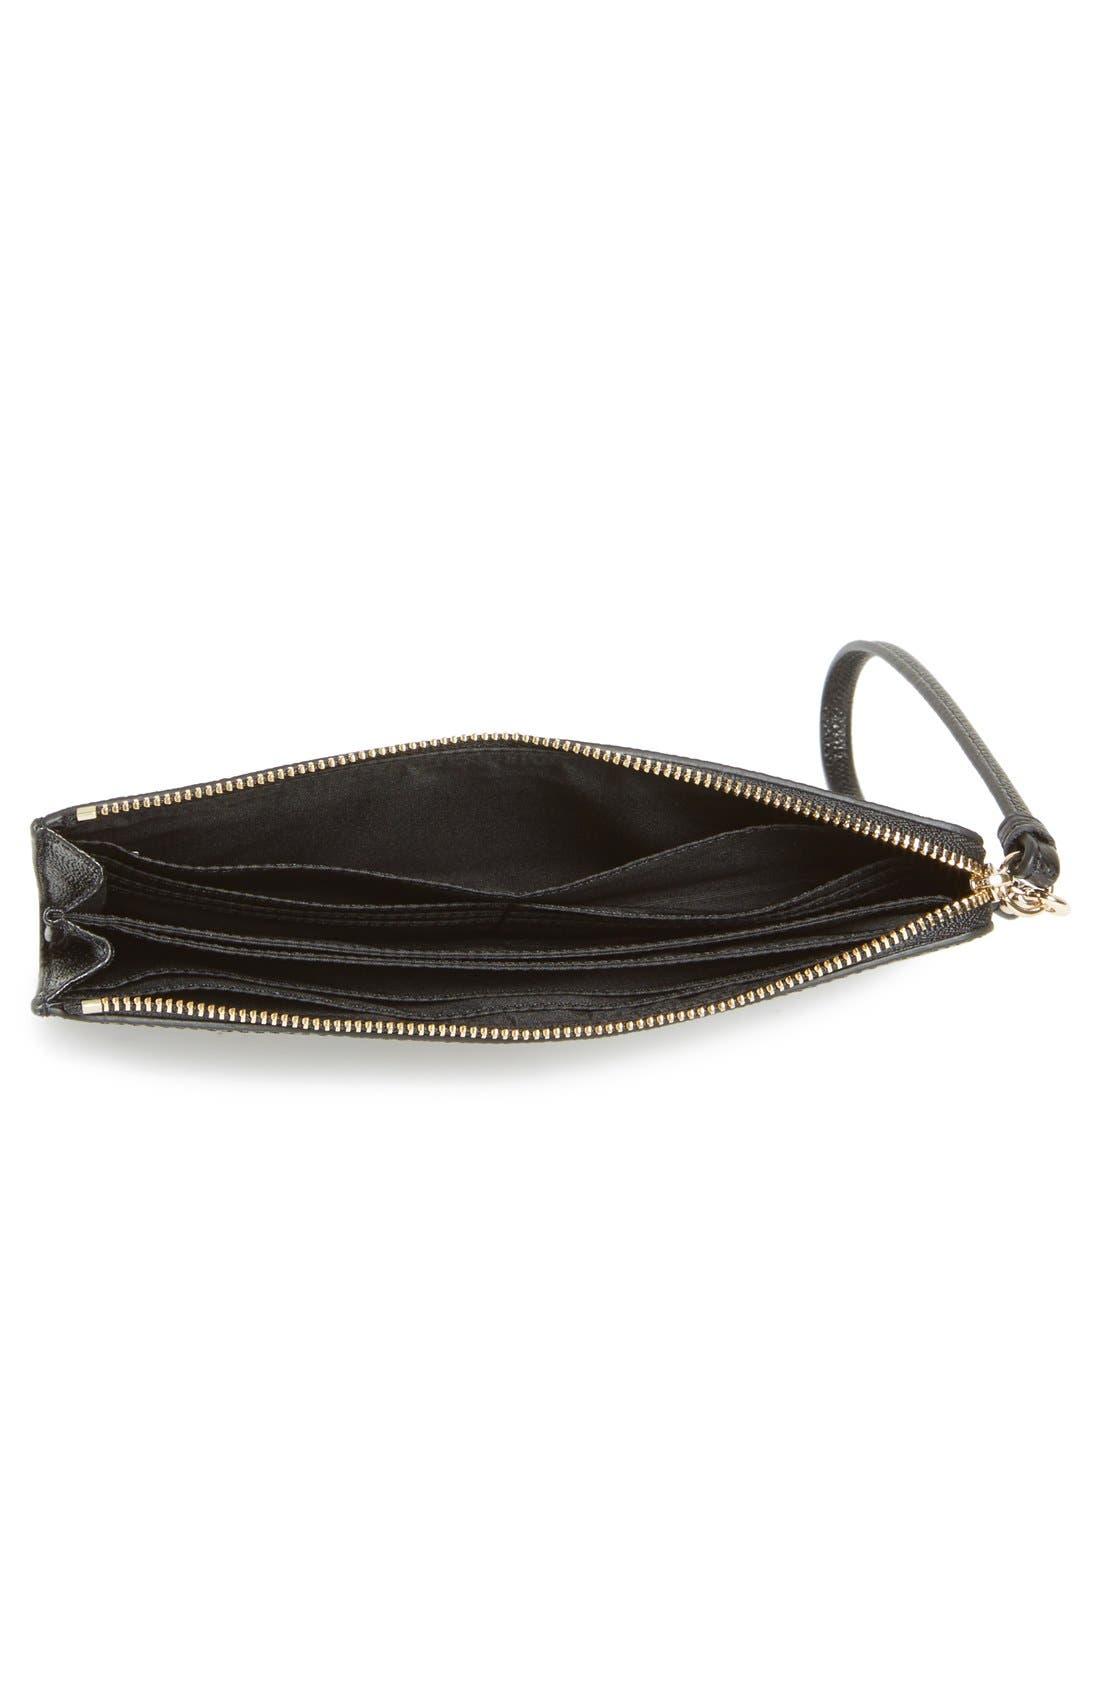 'Zippy' Leather Wallet,                             Alternate thumbnail 3, color,                             001